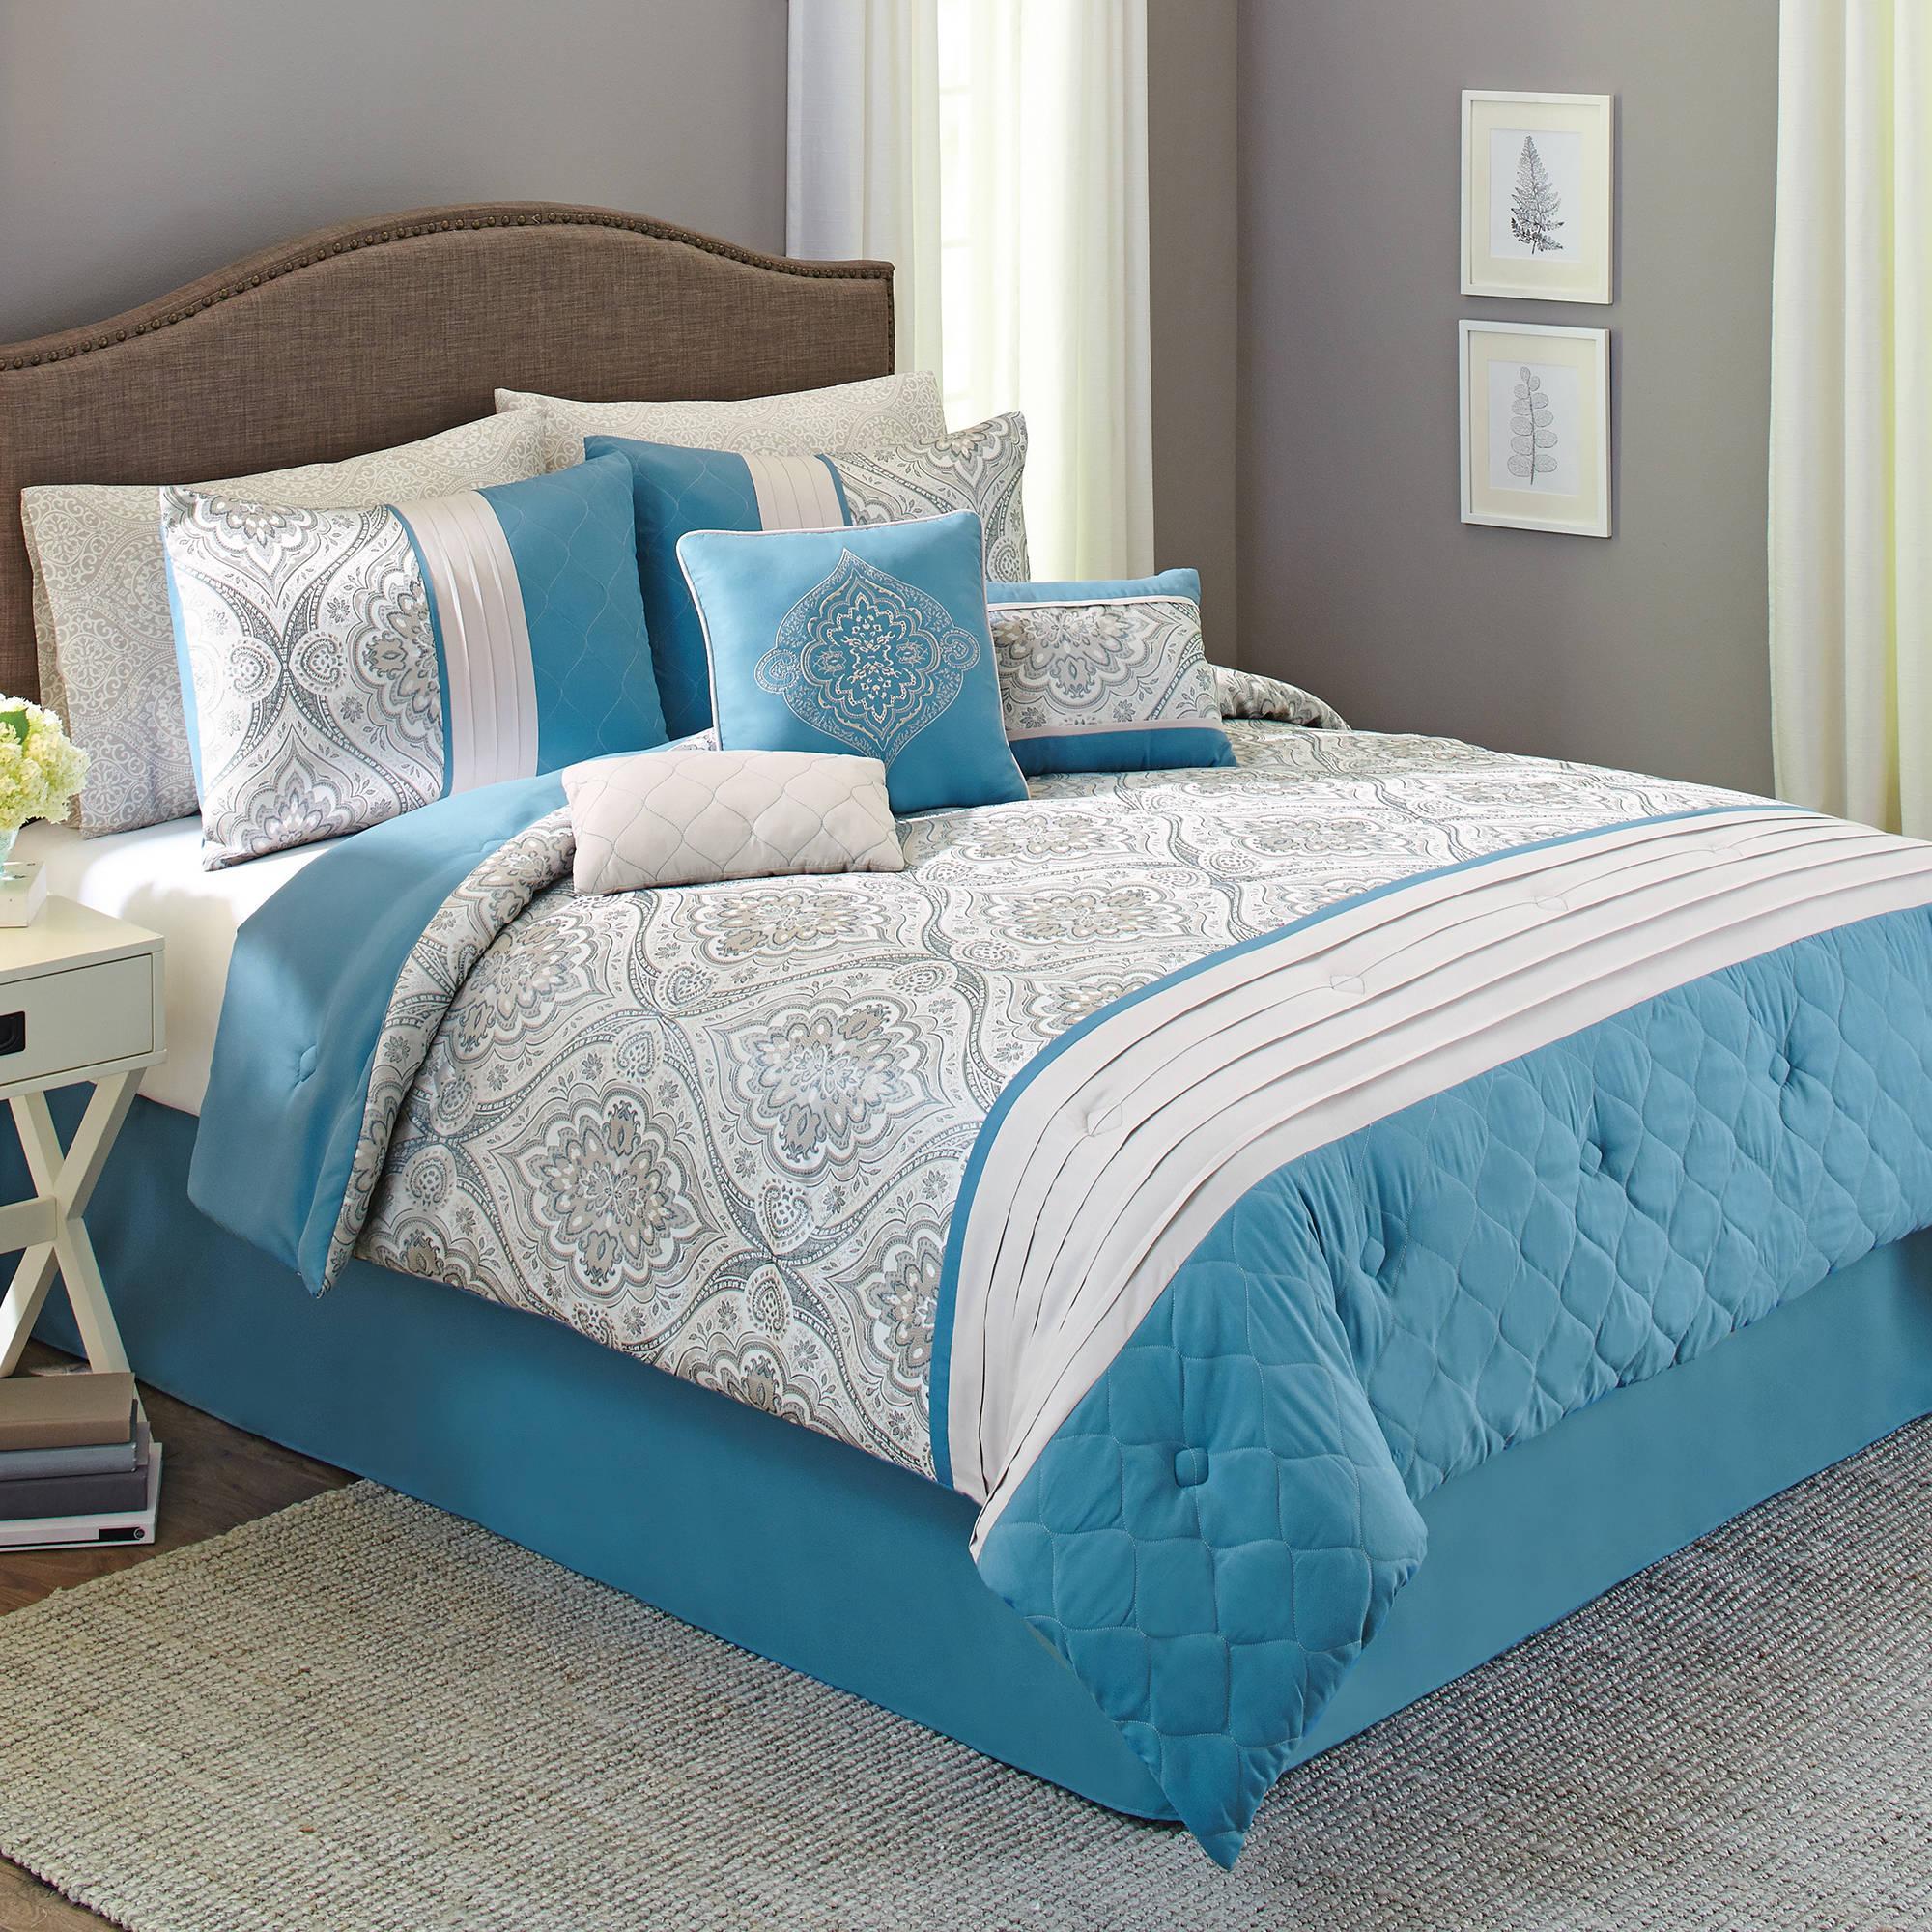 Better Homes and Garden Comforter Sets